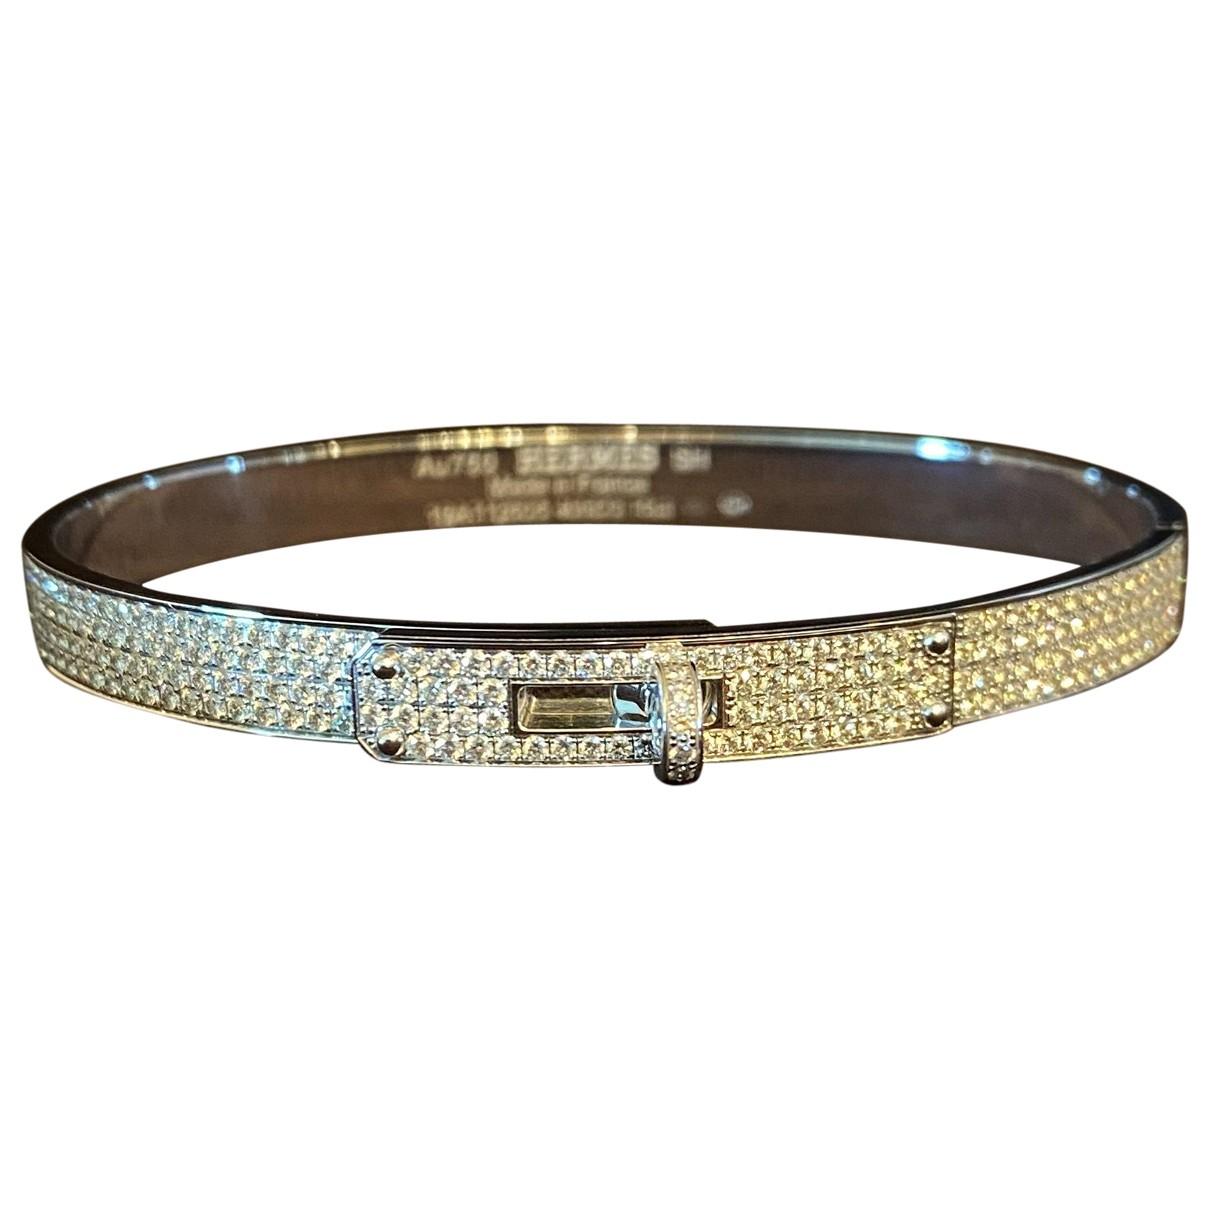 Hermes - Bracelet Kelly pour femme en or blanc